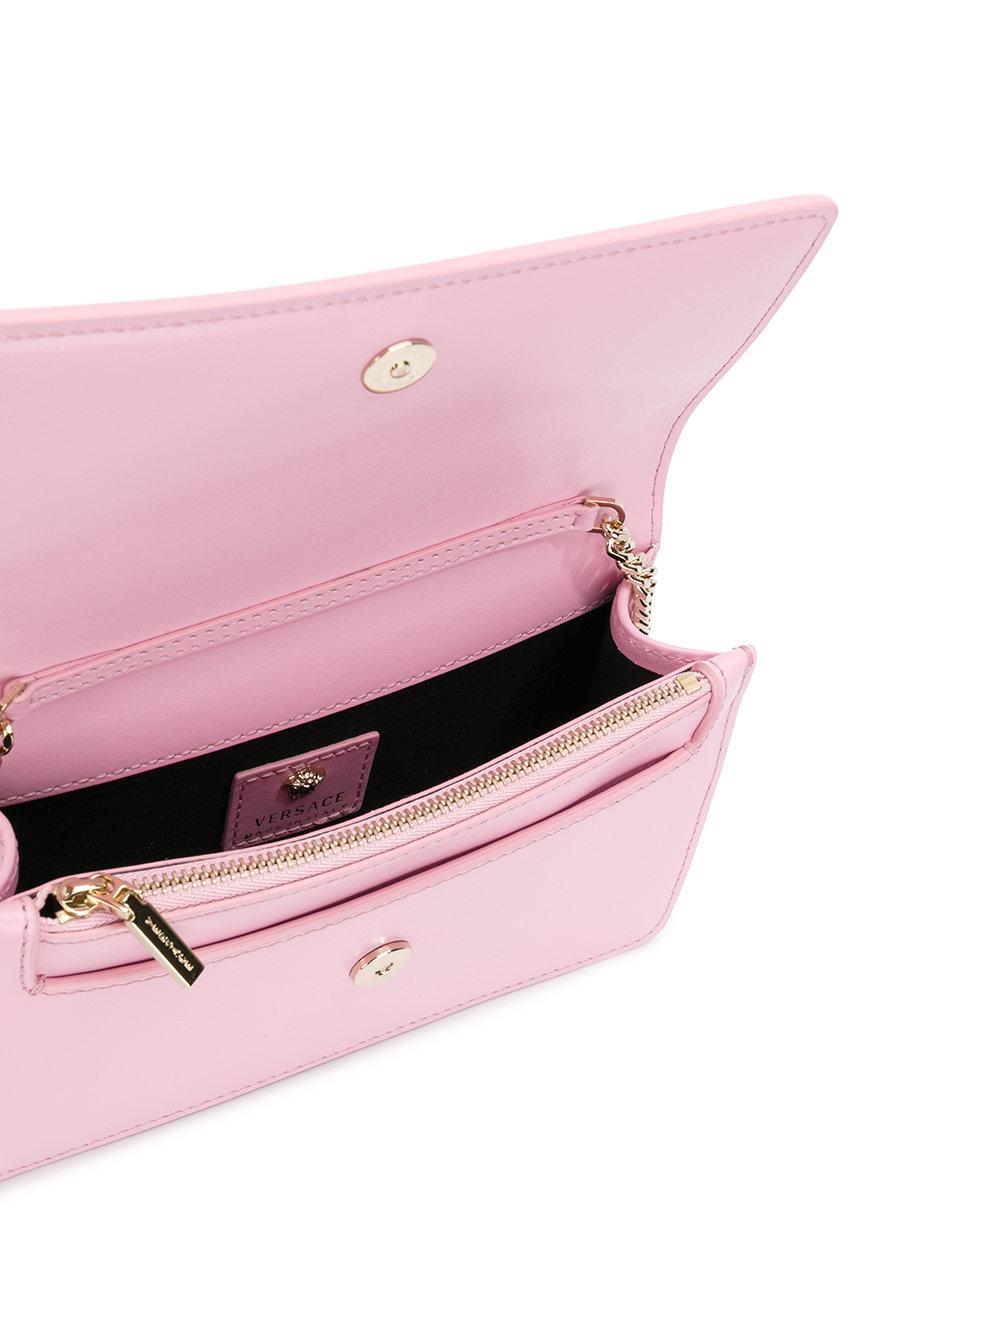 80a8e222146e Lyst - Versace Palazzo Medusa Crossbody Bag in Pink